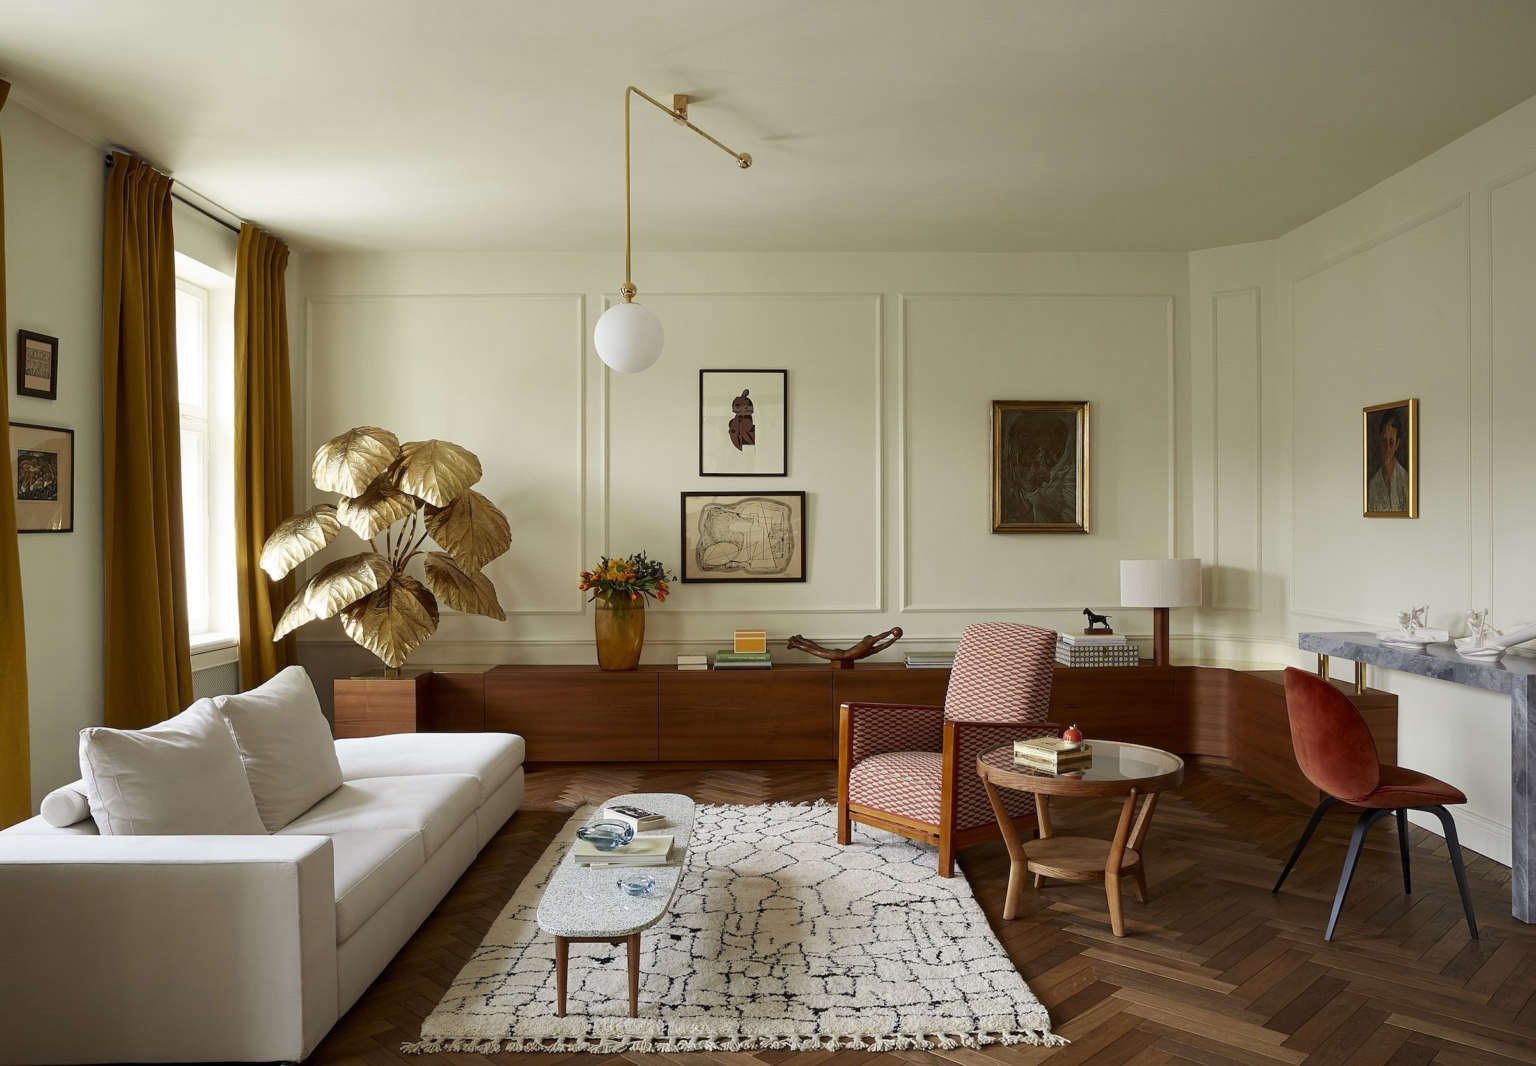 colombe studio marta chrapka warsaw apartment living room